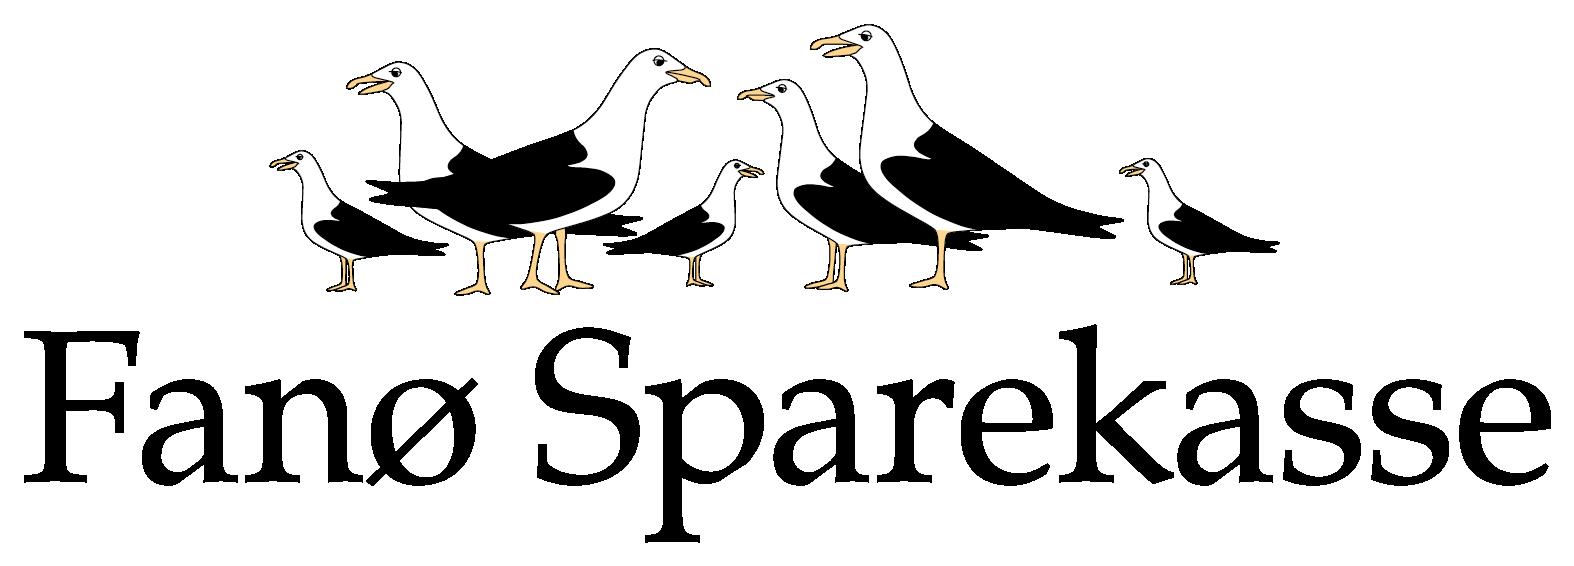 Logo sort@3x.png